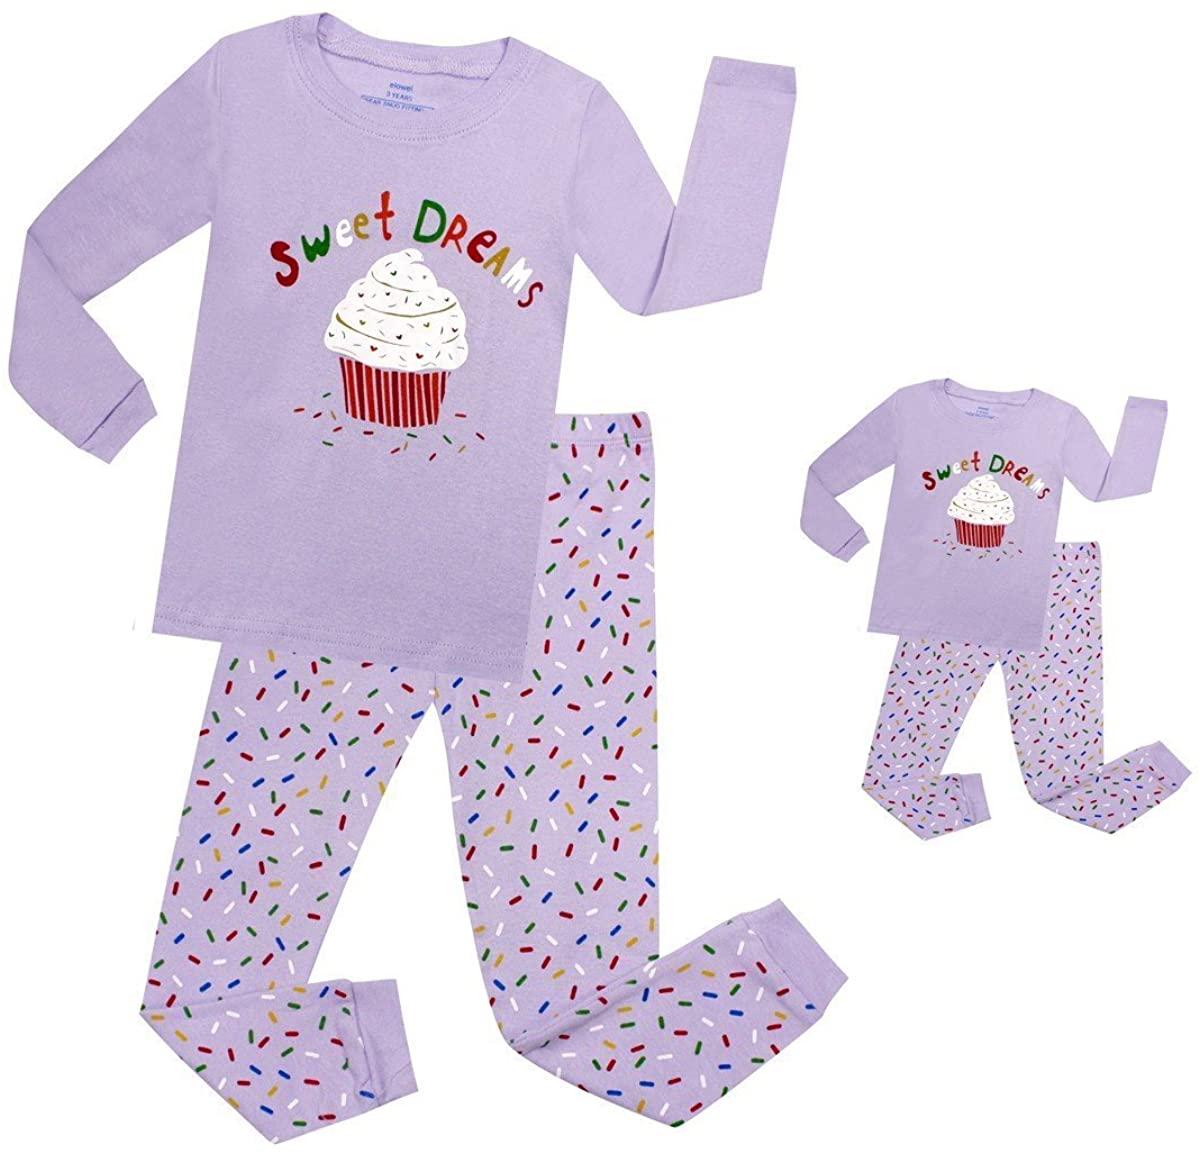 Elowel Cupcake Matching Girls & Doll 2 Piece Pajama Set 100% Cotton (Size 2-12 Years)